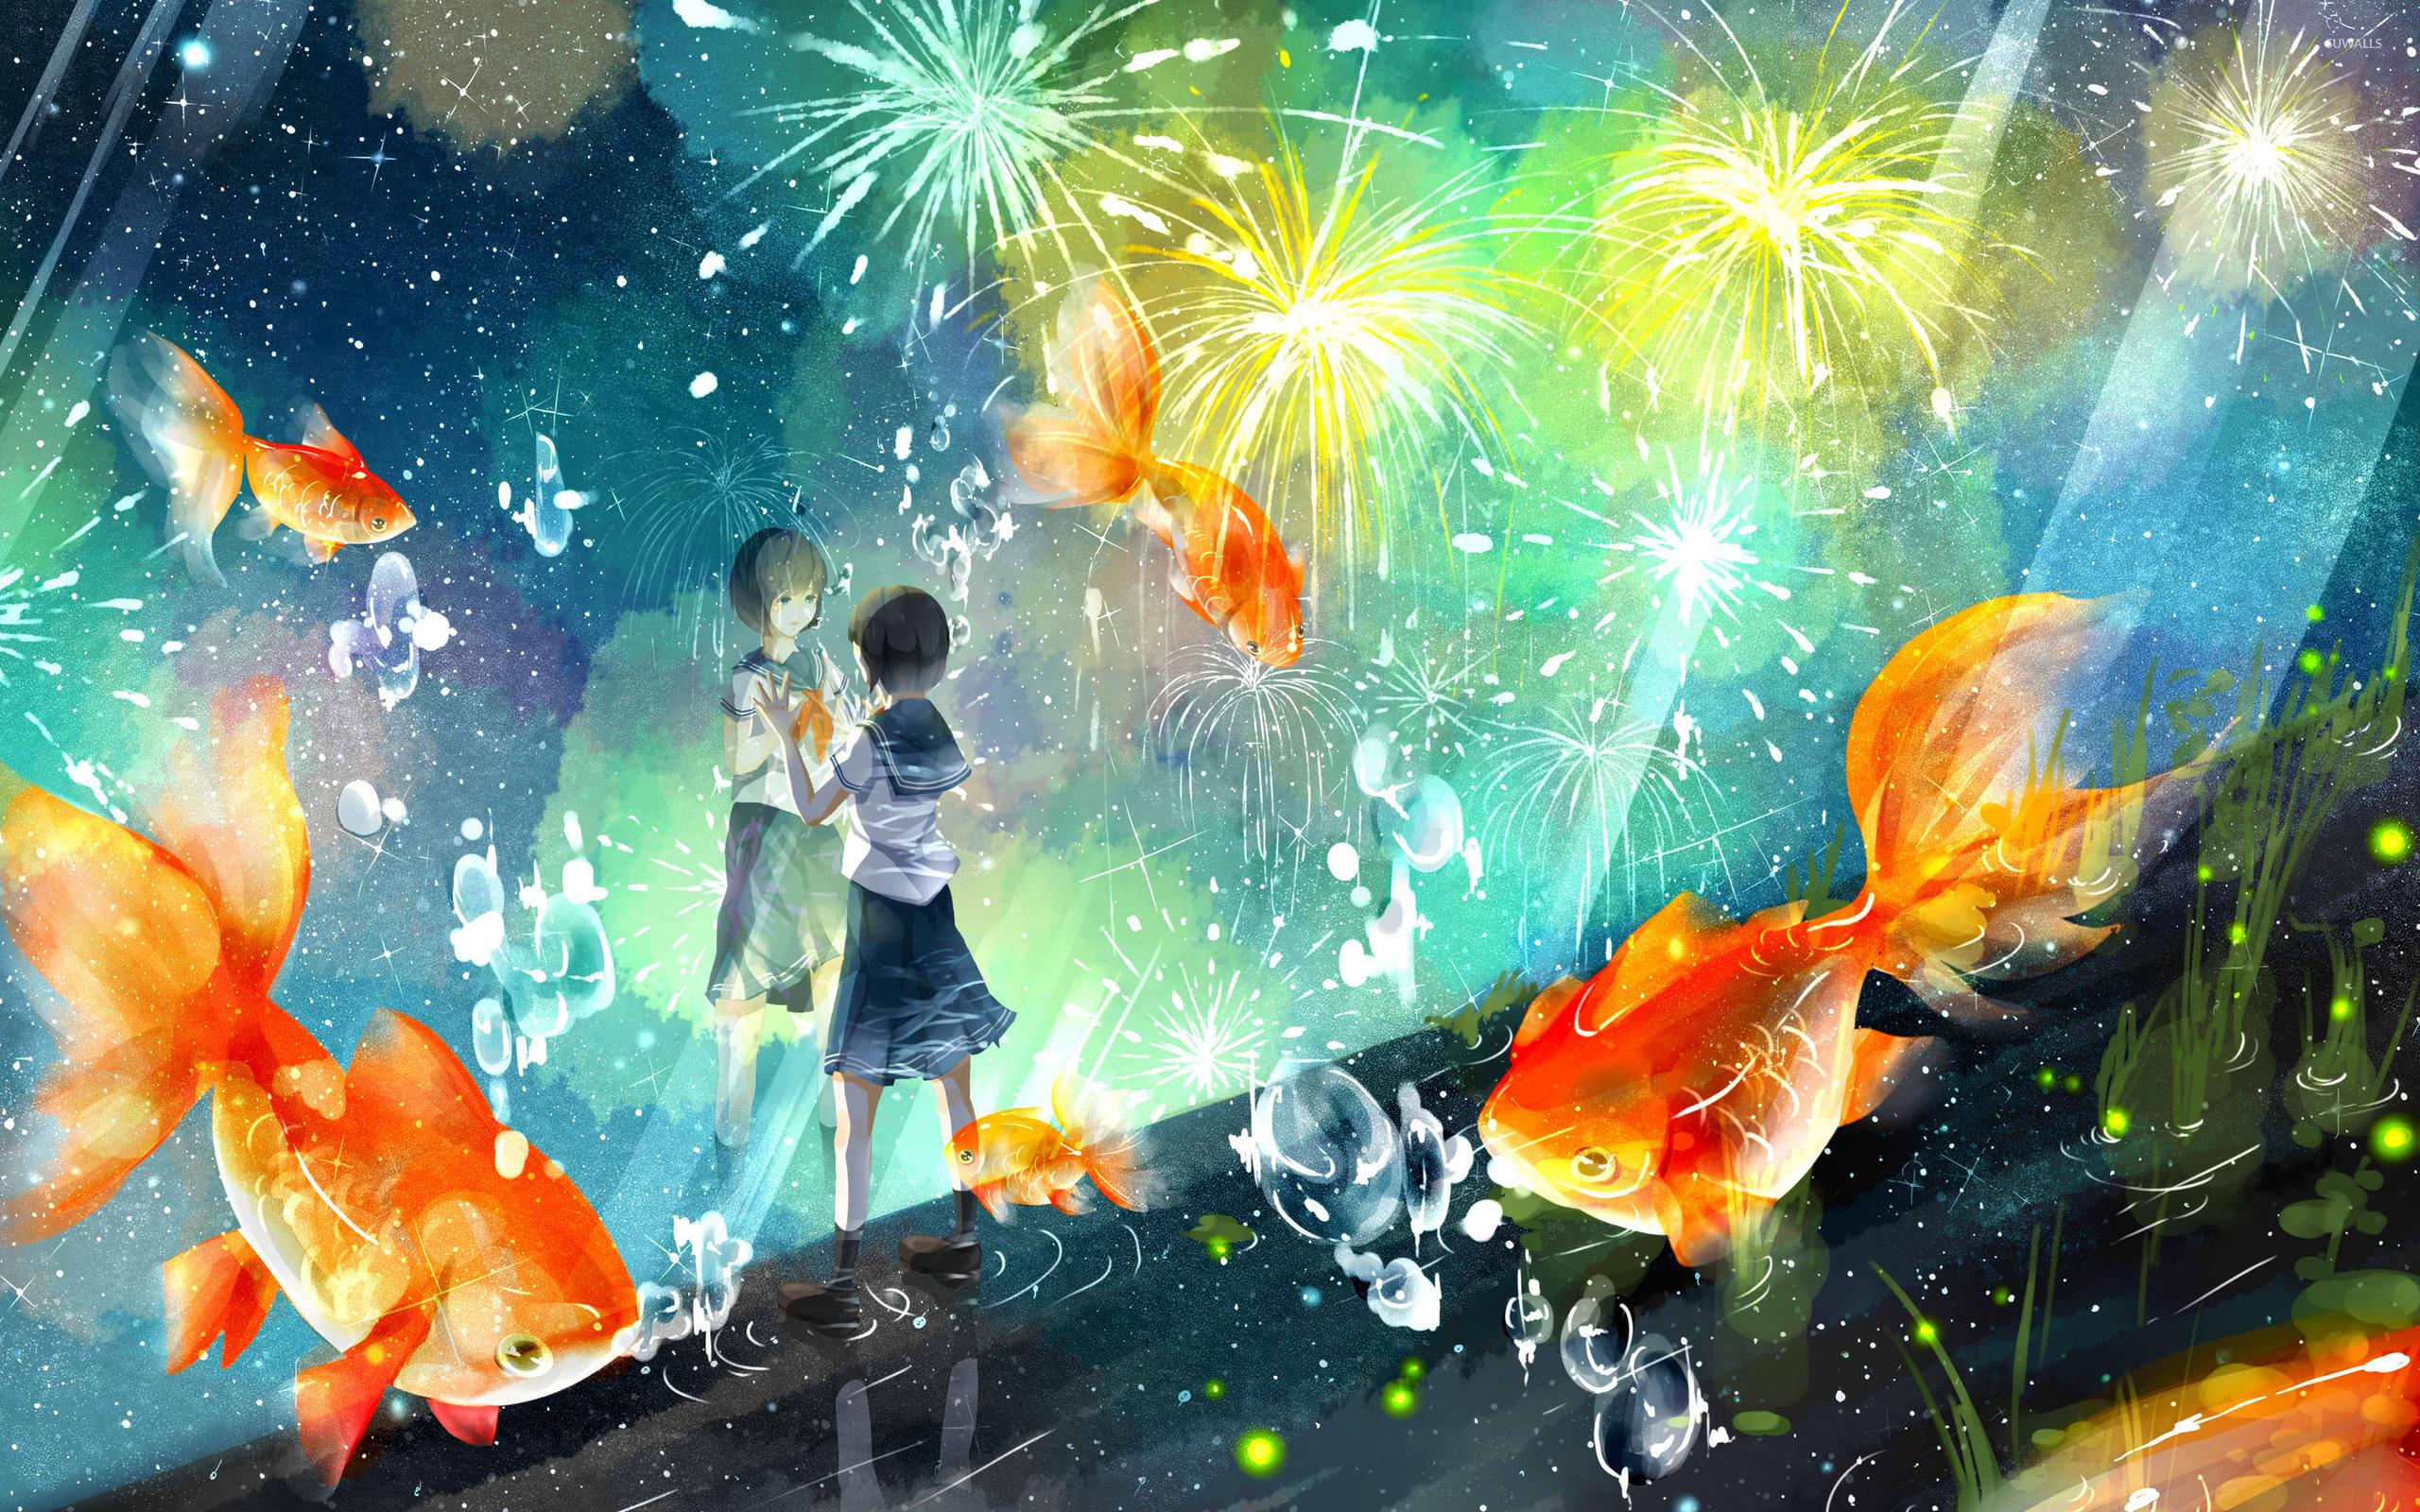 Koi Fish Iphone Wallpaper Schoolgirl Wathing The Fireworks Wallpaper Anime